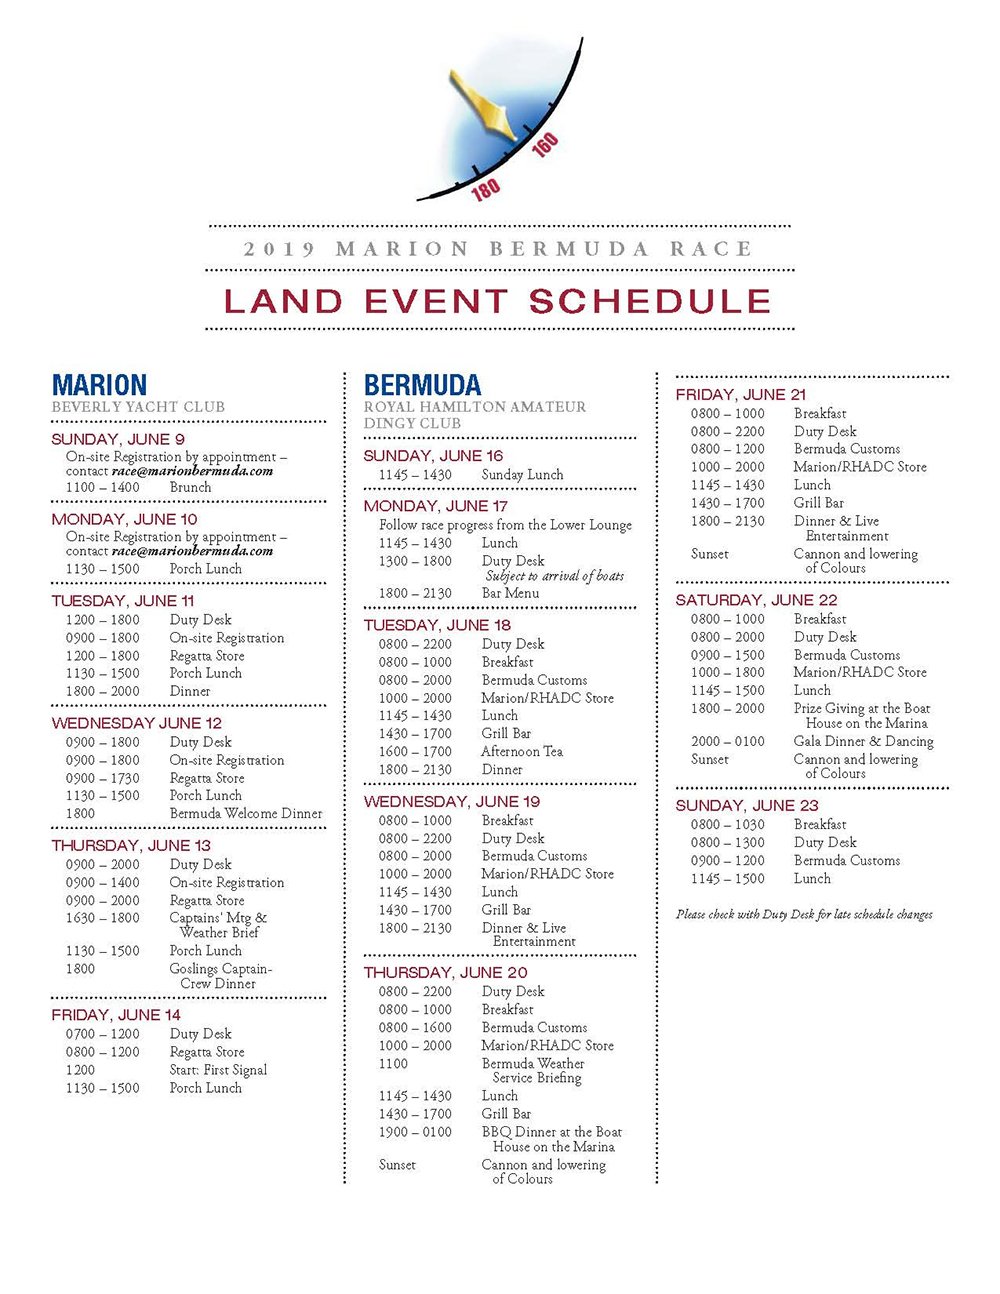 Land Event Schedule Bermuda June 17 2019